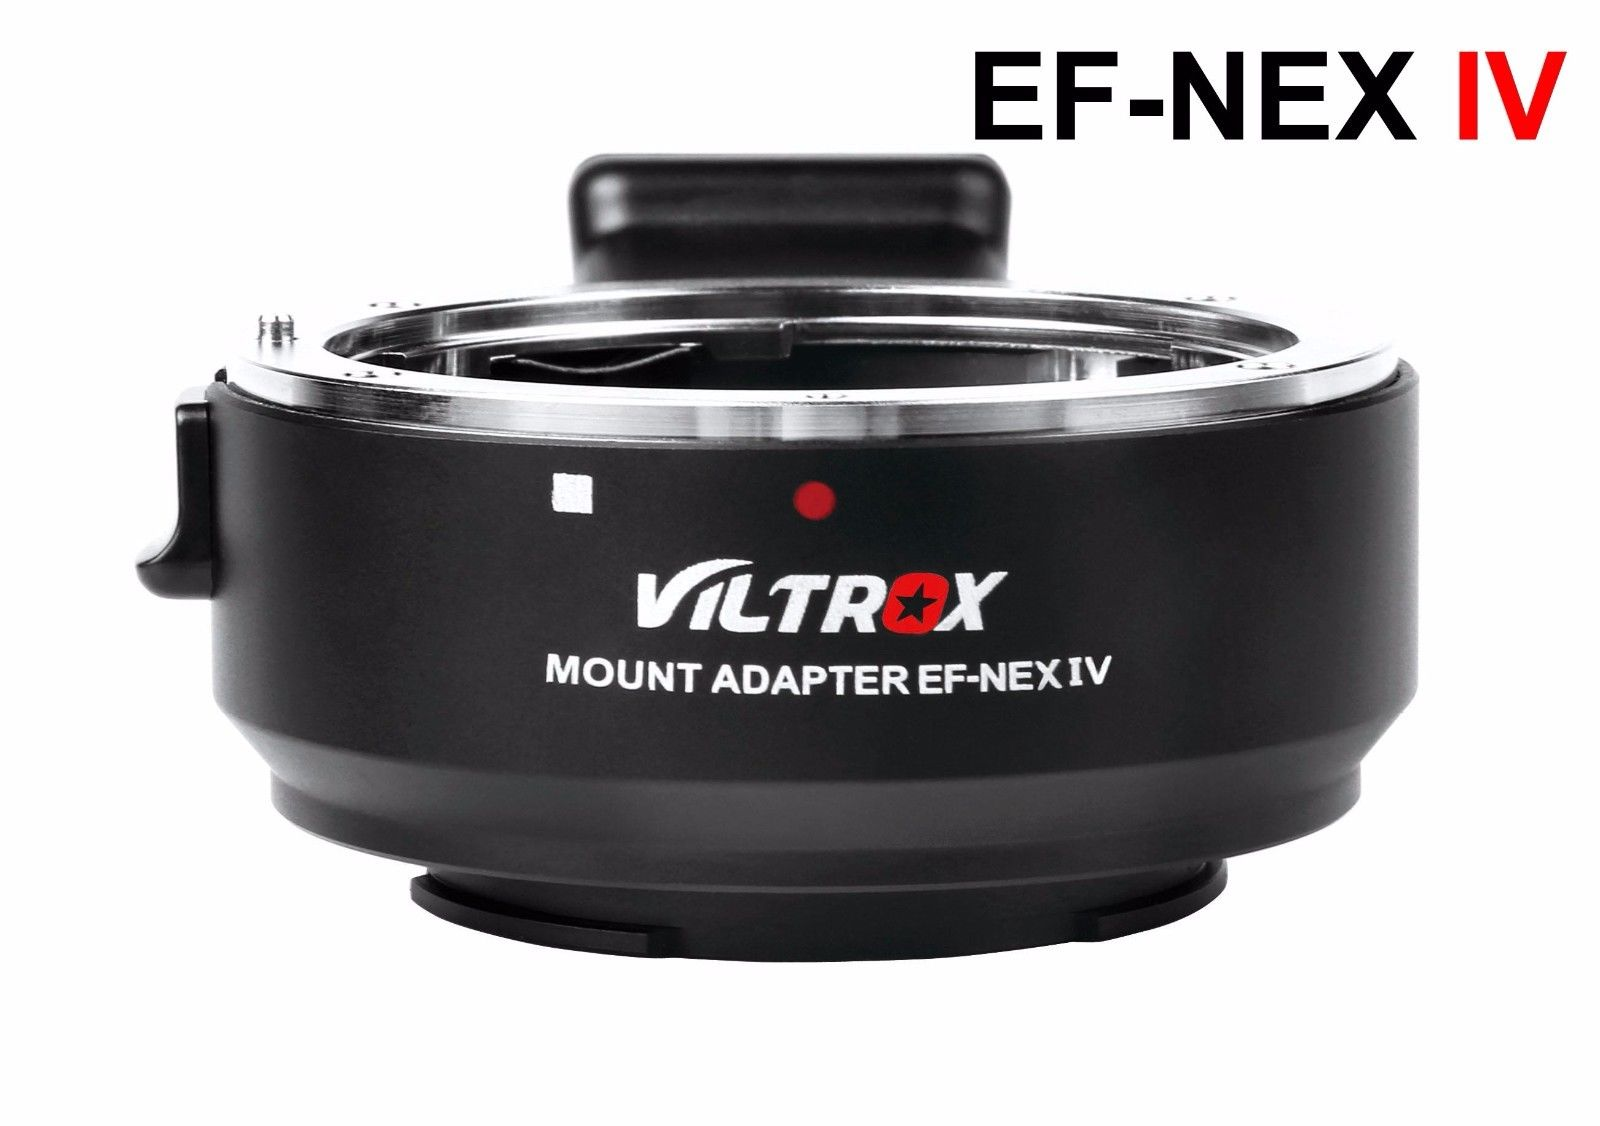 Viltrox EF-NEX IV Auto Focus Lens Adapter for Canon EOS EF EF-S Lens to Sony E NEX Full Frame A9 A7 A7II A7RII A7SII A6500 A6300 viltrox ef nex auto focus lens adapter for canon eos ef ef s lens to sony e nex full frame a7 a7r a7sii a6300 a6000 nex 7